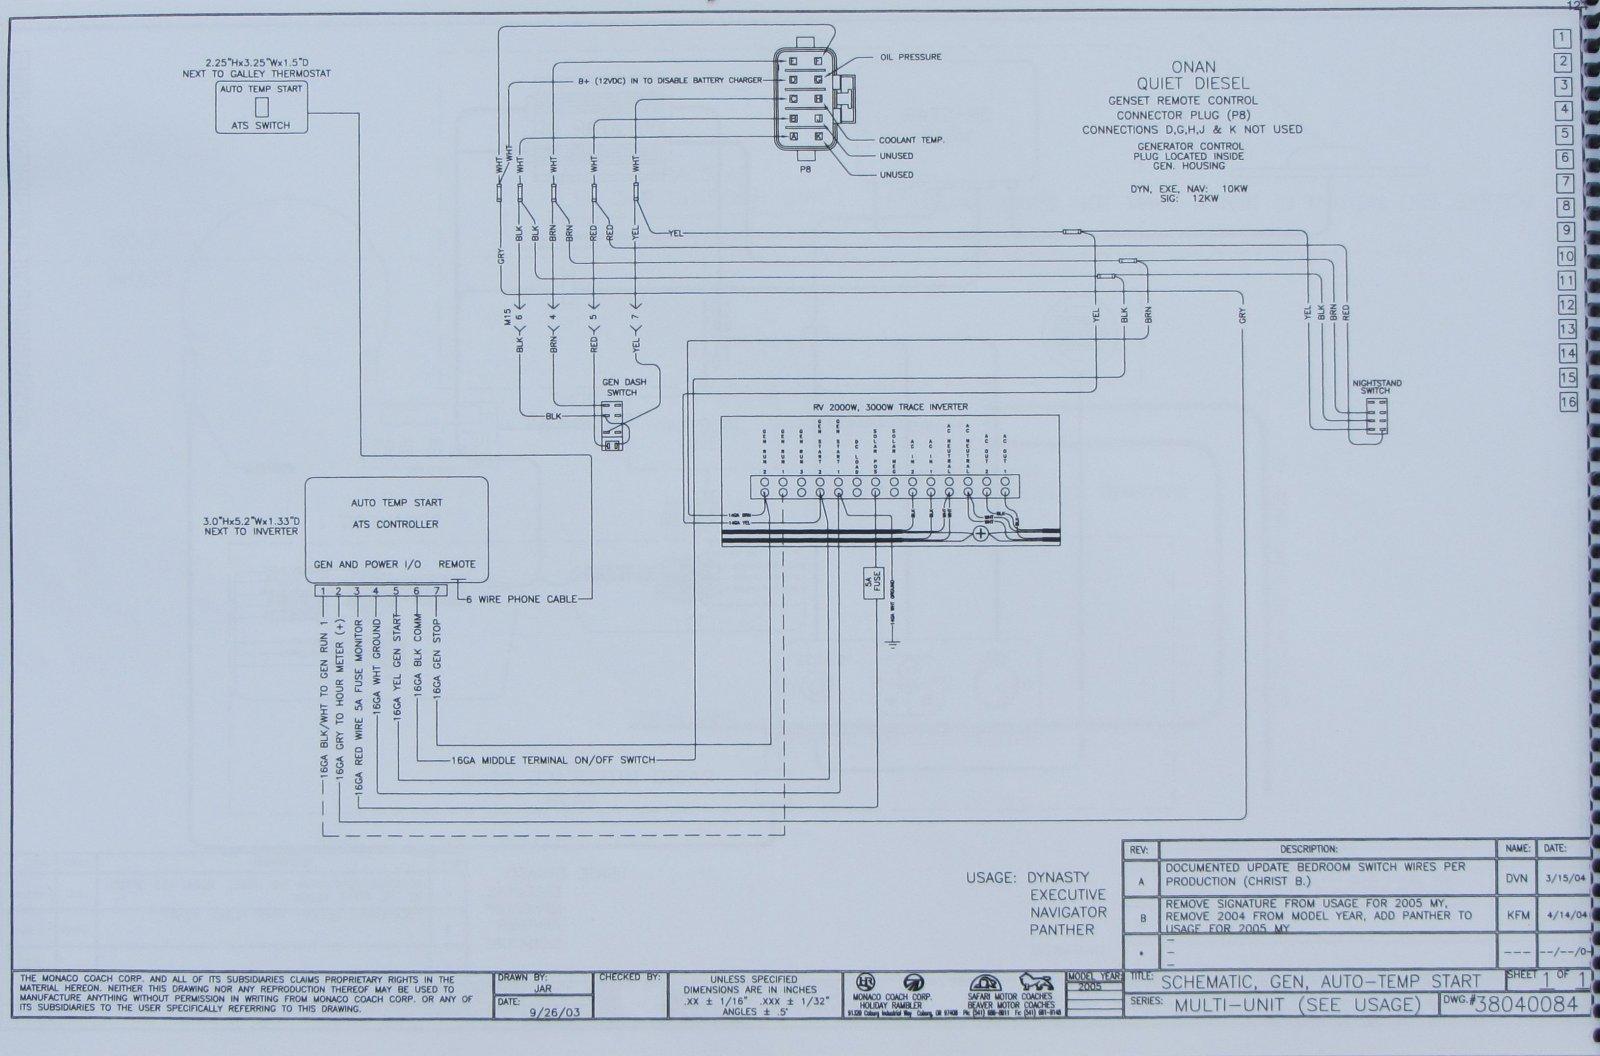 2005 Holiday Rambler Wiring Diagram - 1986 Chevy Wiring Diagram | Bege Wiring  Diagram | 2005 Holiday Rambler Wiring Diagram |  | Bege Place Wiring Diagram - Bege Wiring Diagram